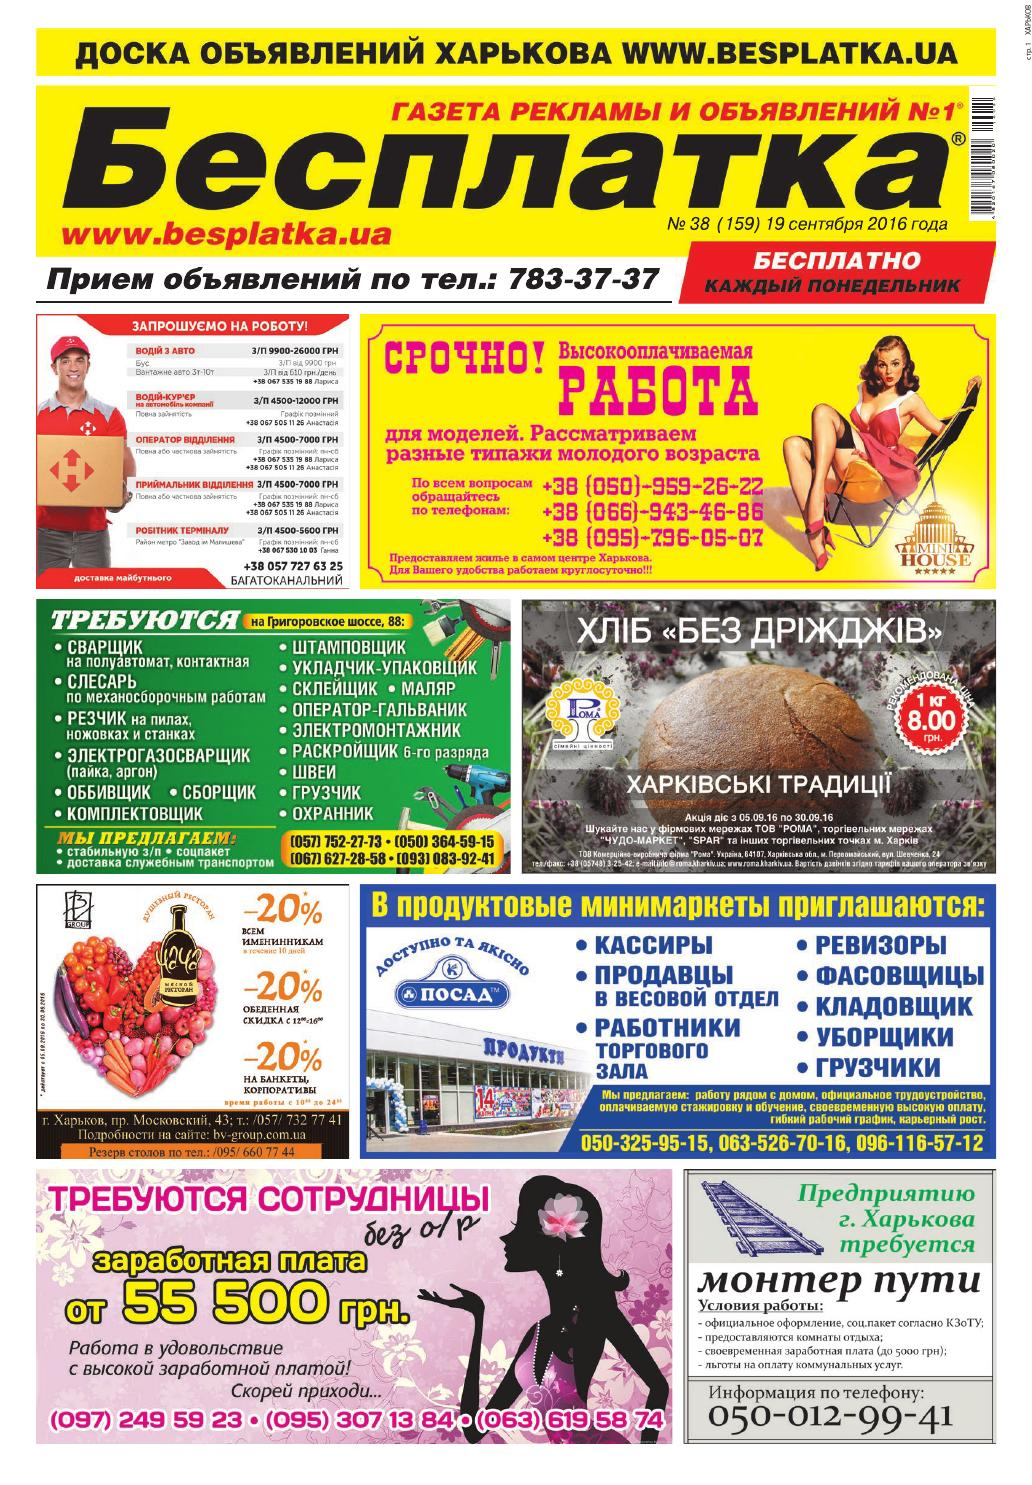 a7c9cc237c66 Besplatka  38 Харьков by besplatka ukraine - issuu